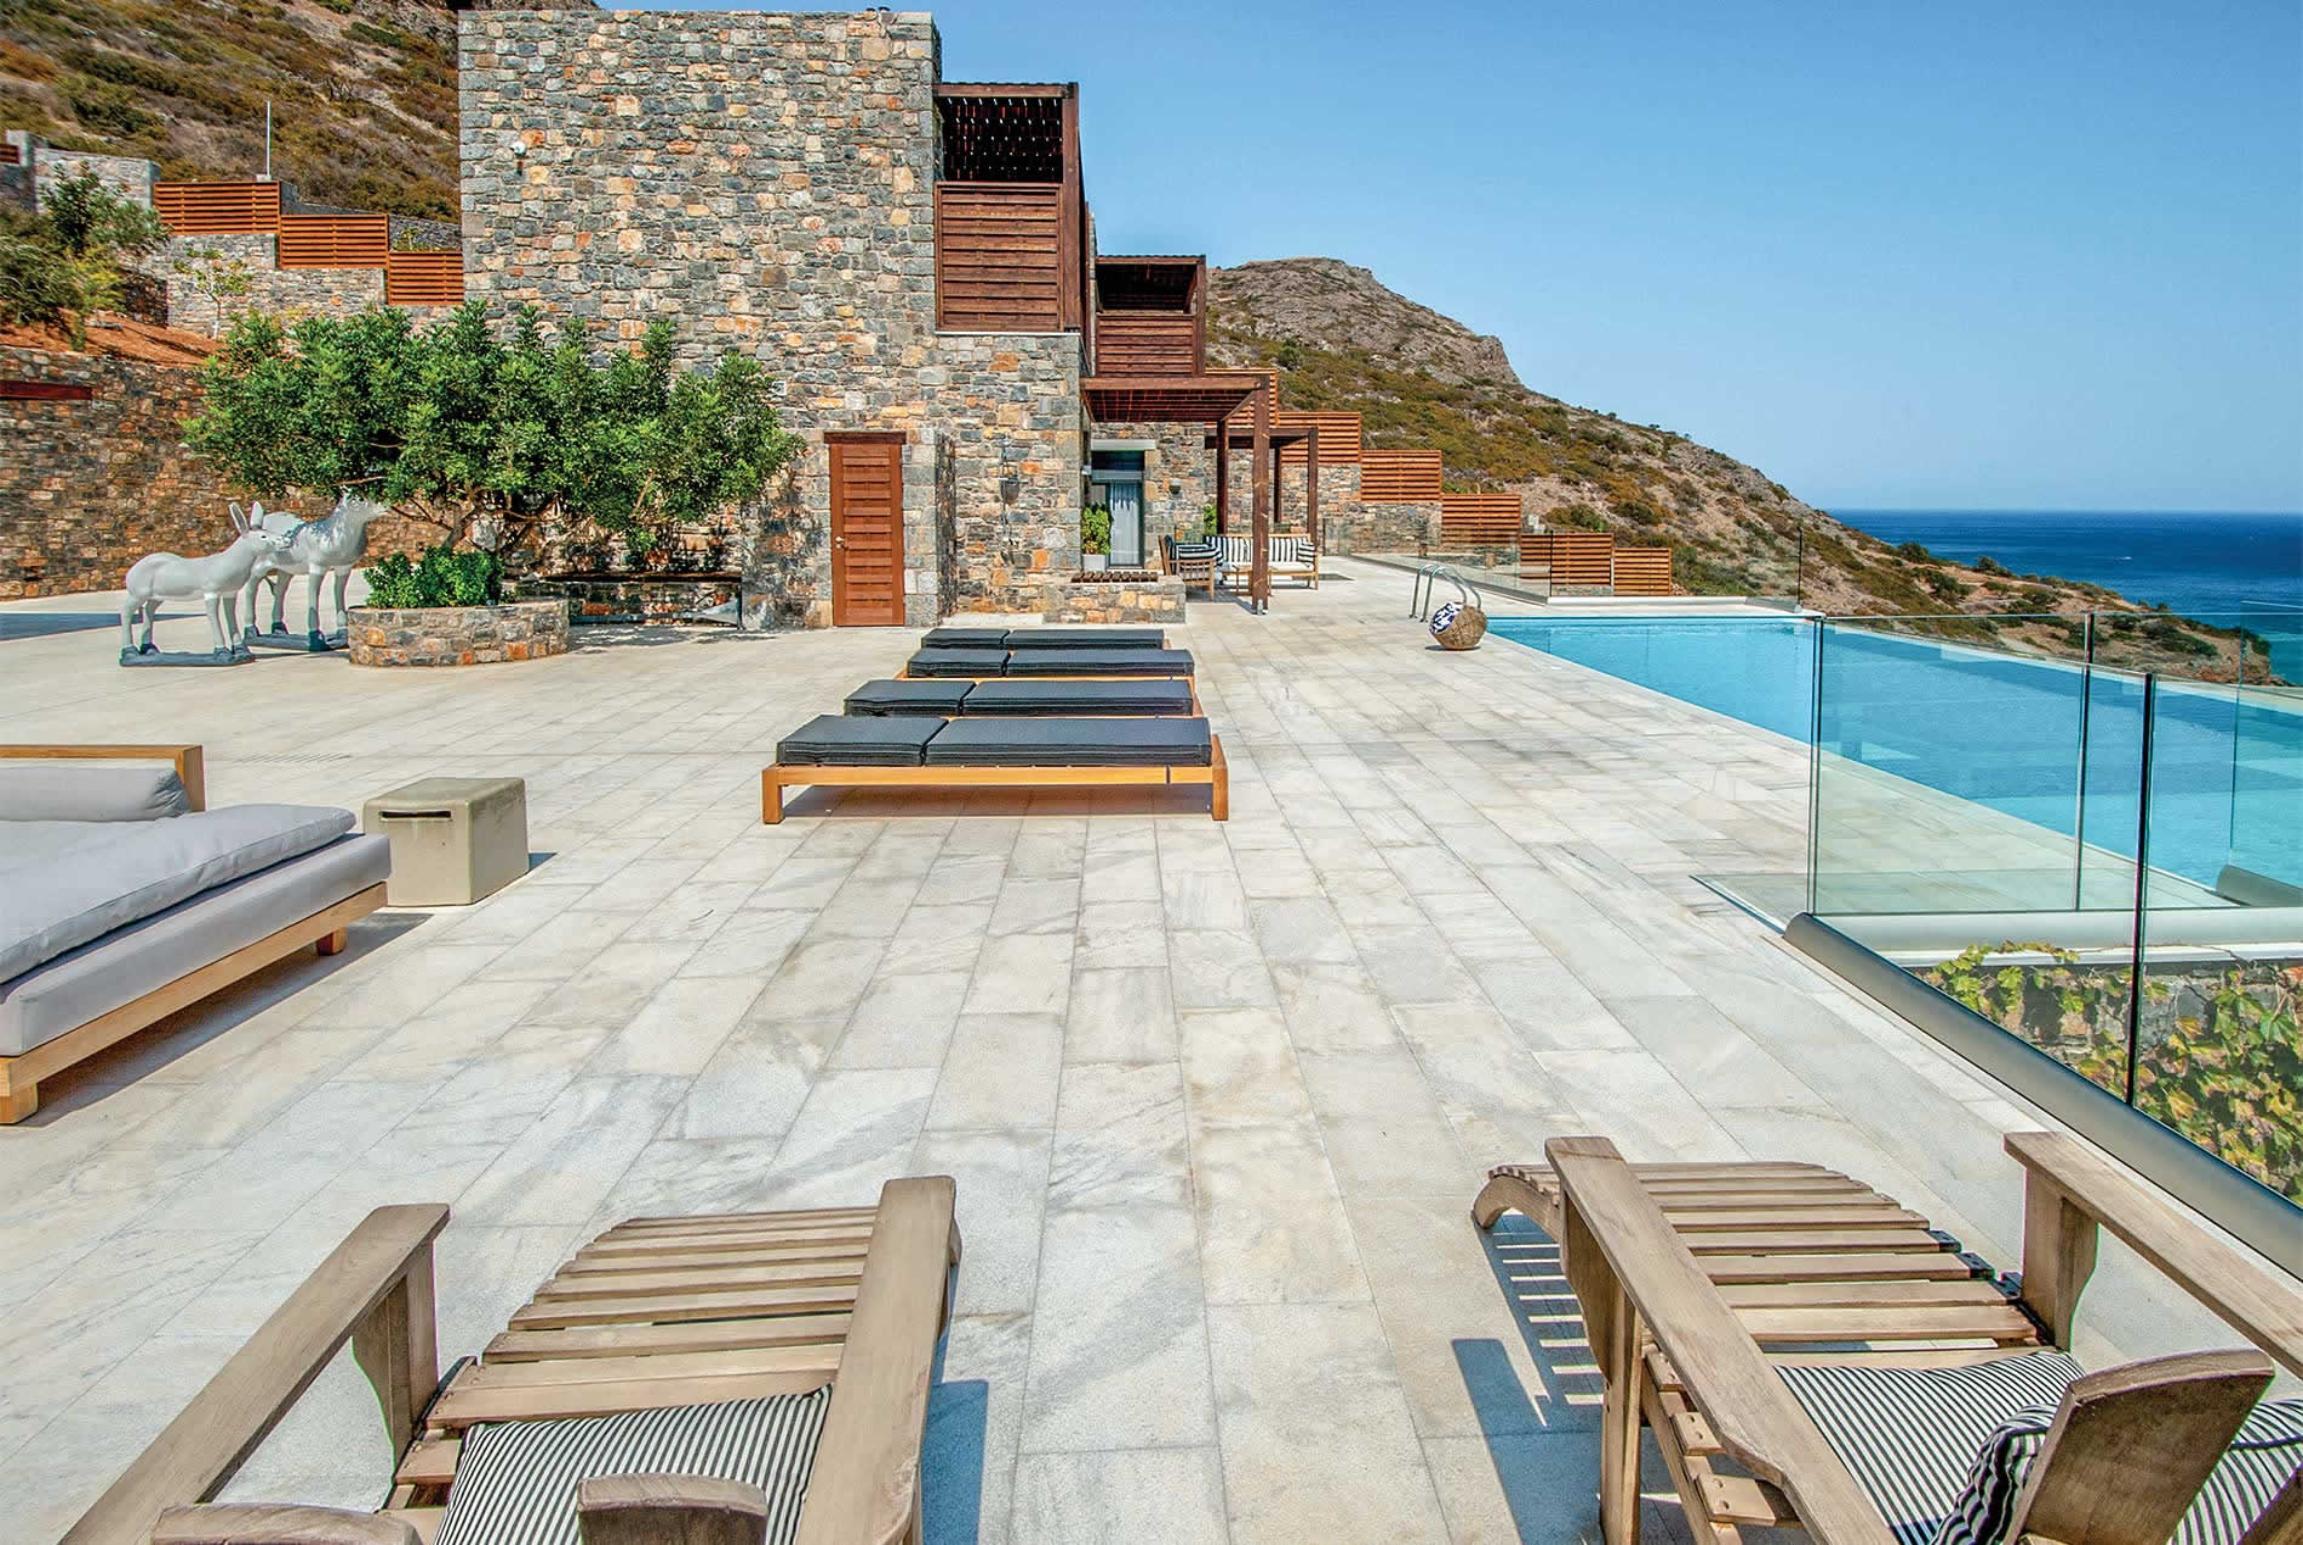 Ferienhaus Dimitra (2654194), Plaka, Kreta Nordküste, Kreta, Griechenland, Bild 7